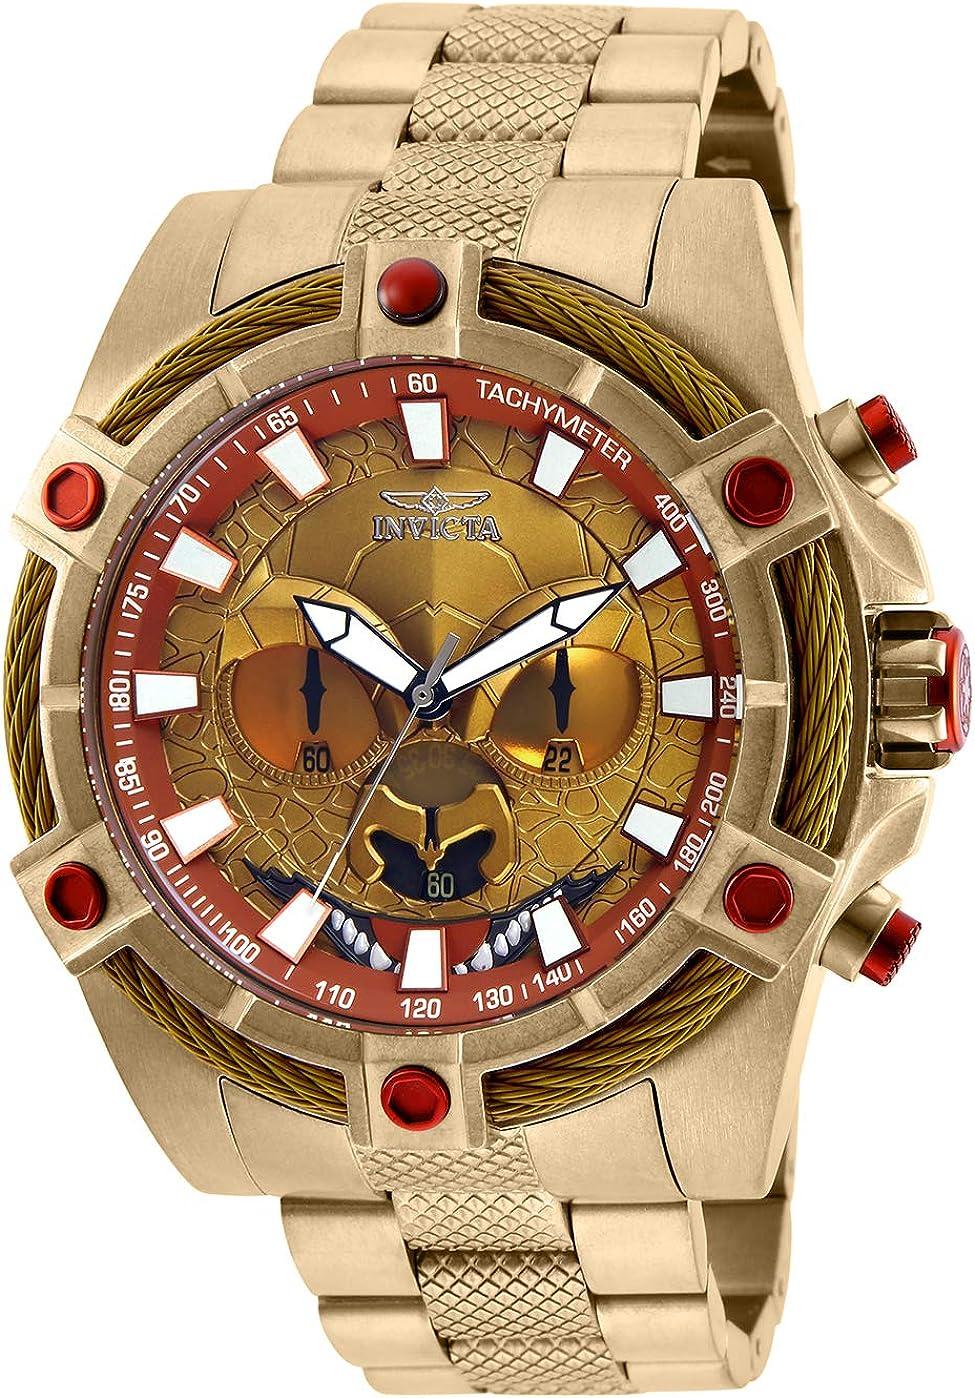 Invicta Men s Star Wars Quartz Watch with Stainless-Steel Strap, Gold, 26 Model 27237